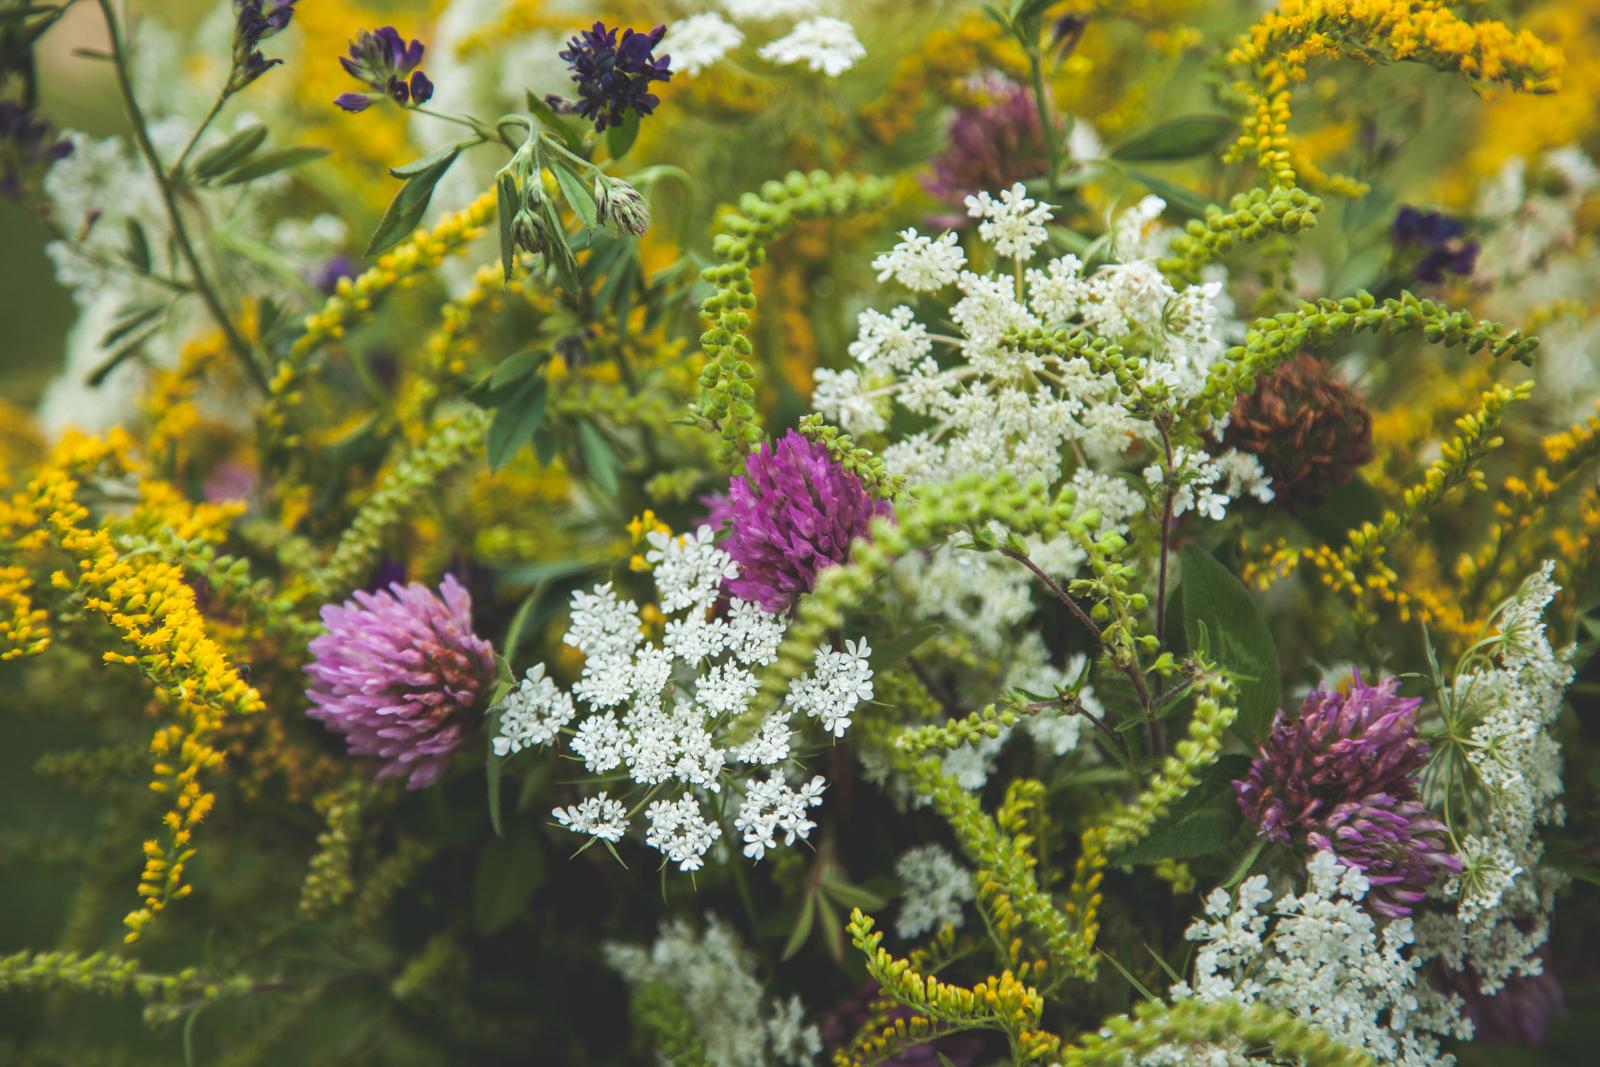 WildflowersPart2-sm-0545.jpg